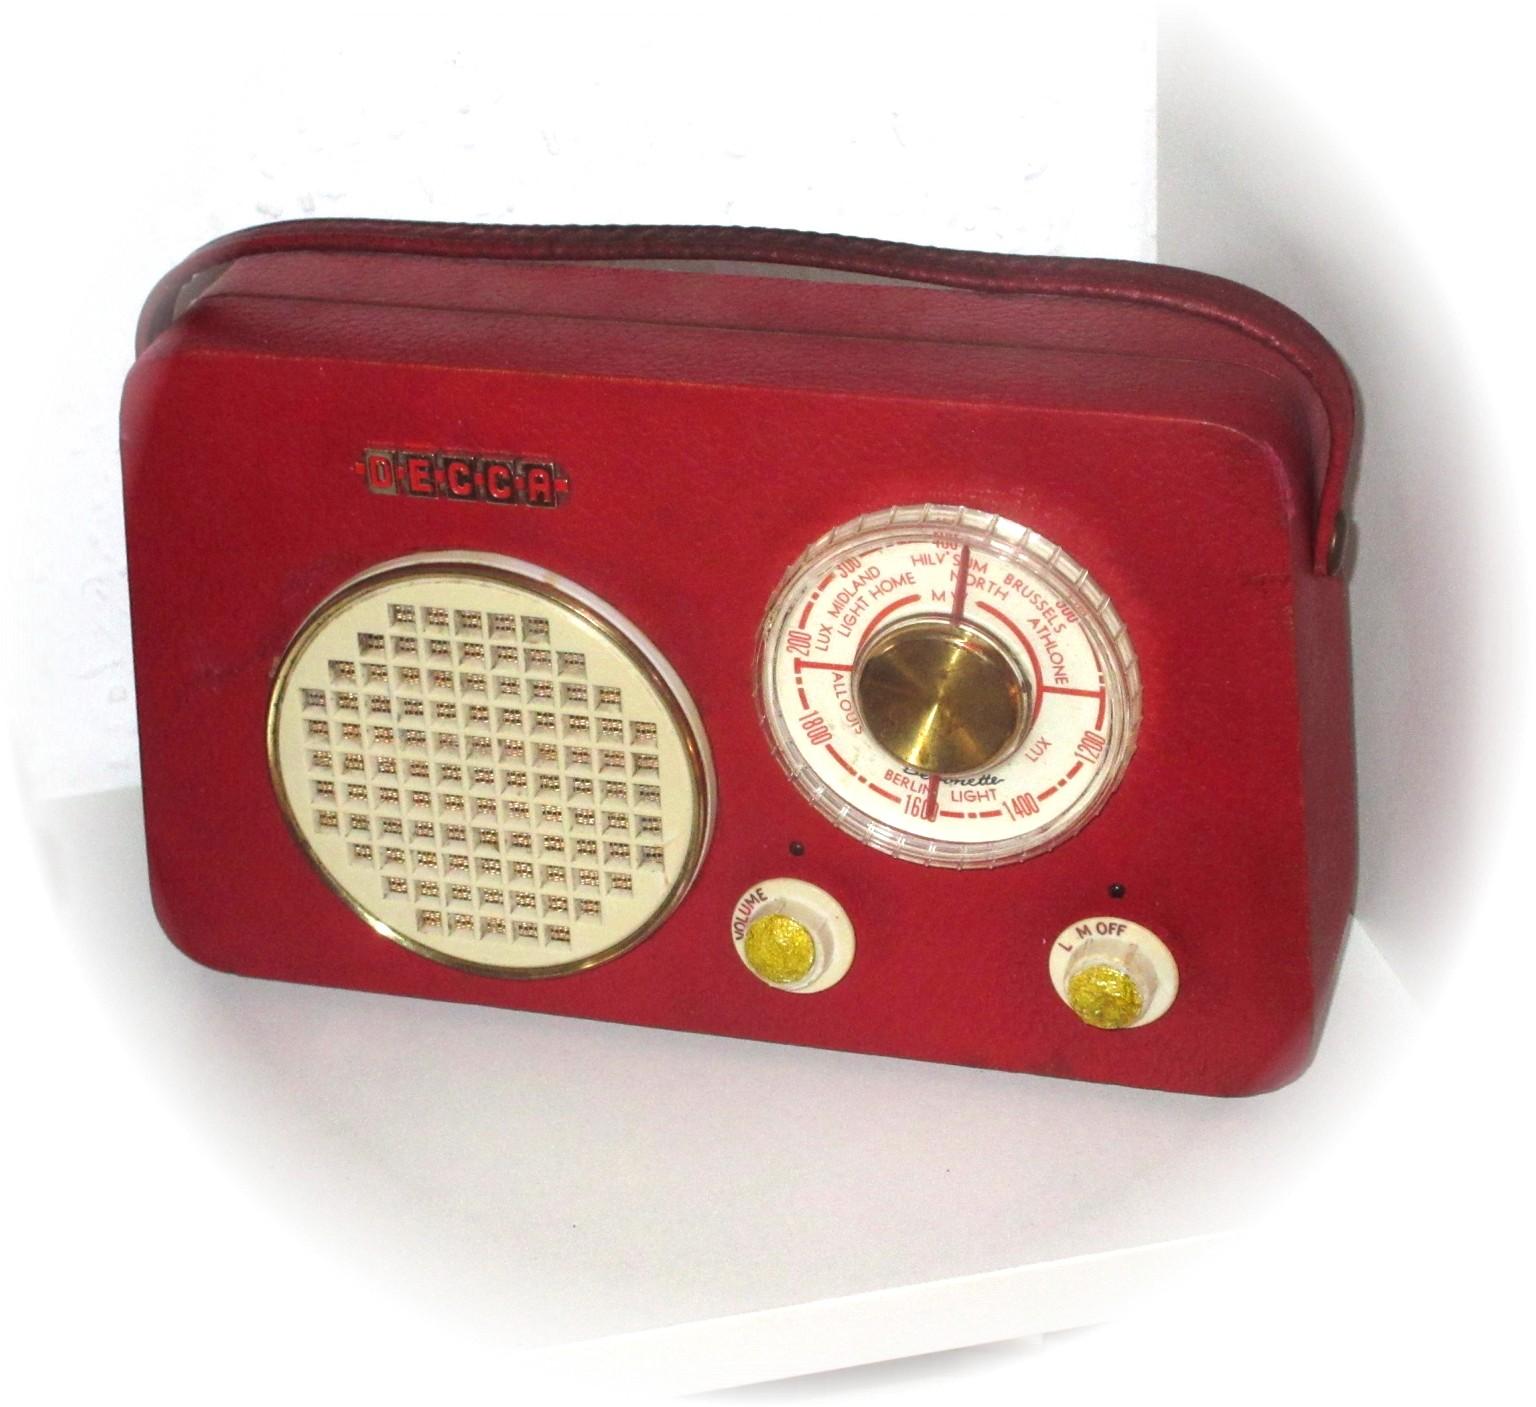 Radio Nold's Blo: Decca TP50 Debonette Radio on